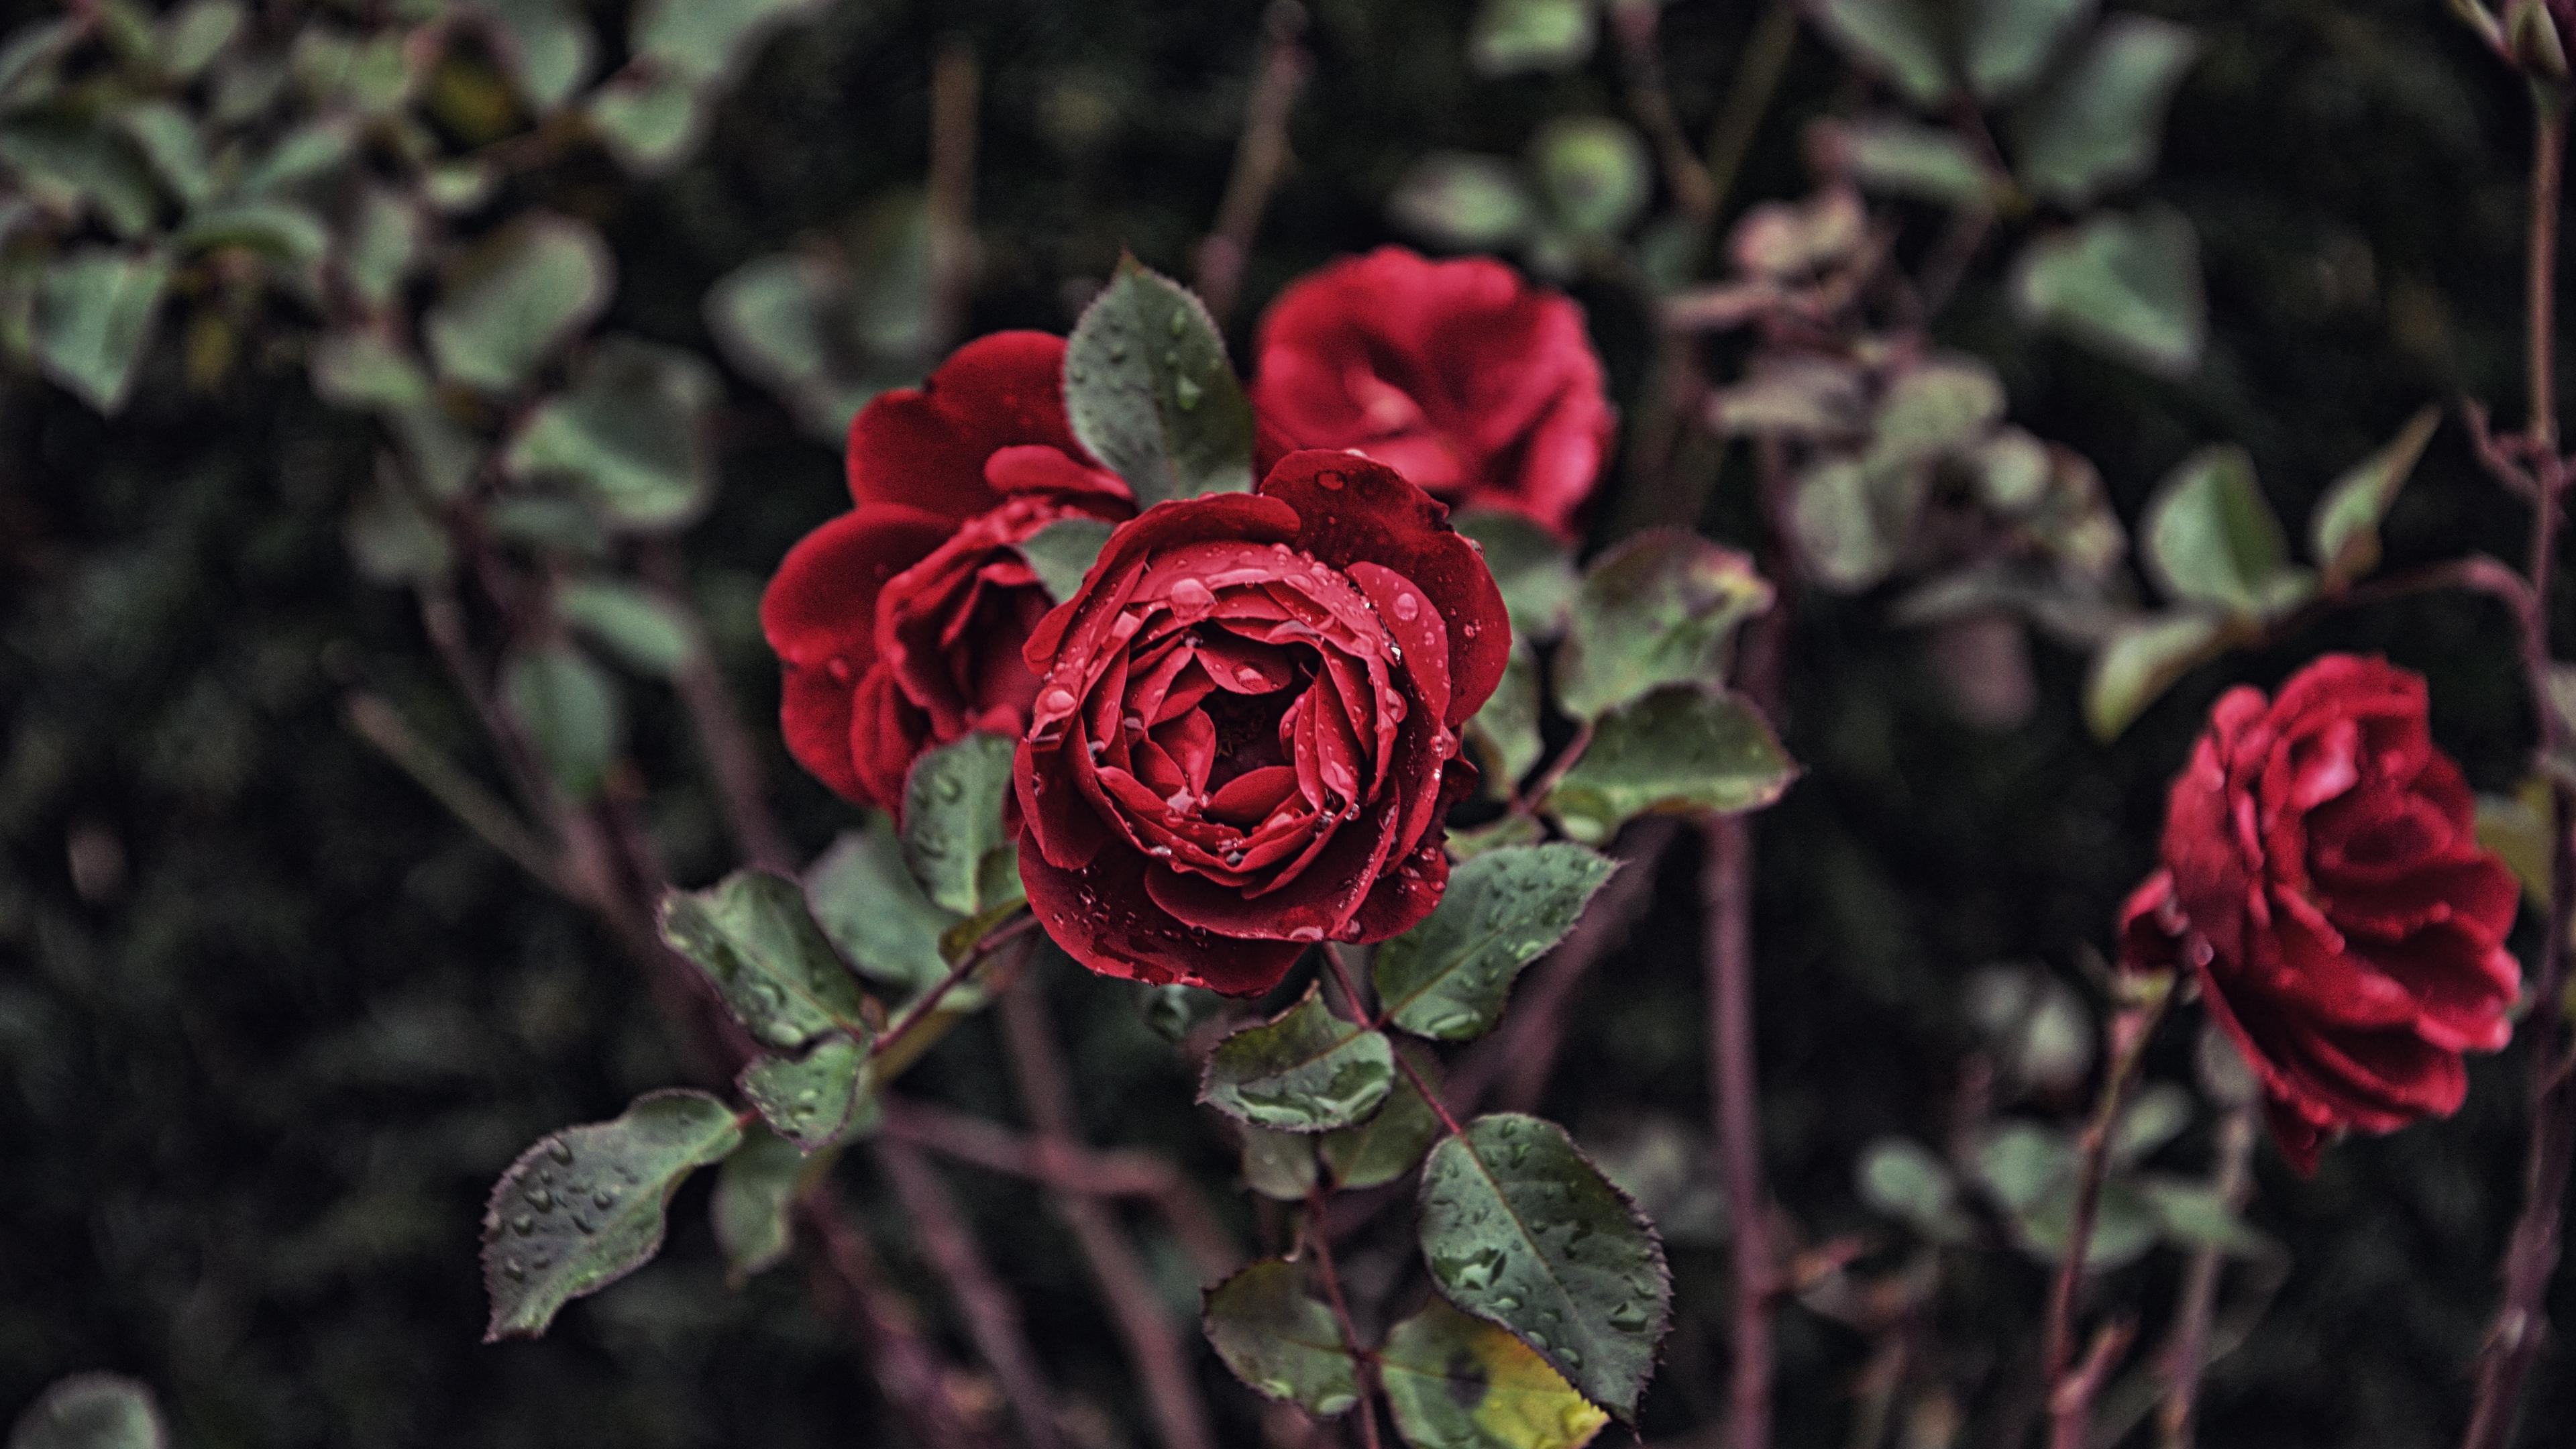 rose drops bud bush blur 4k 1540065246 - rose, drops, bud, bush, blur 4k - Rose, Drops, bud